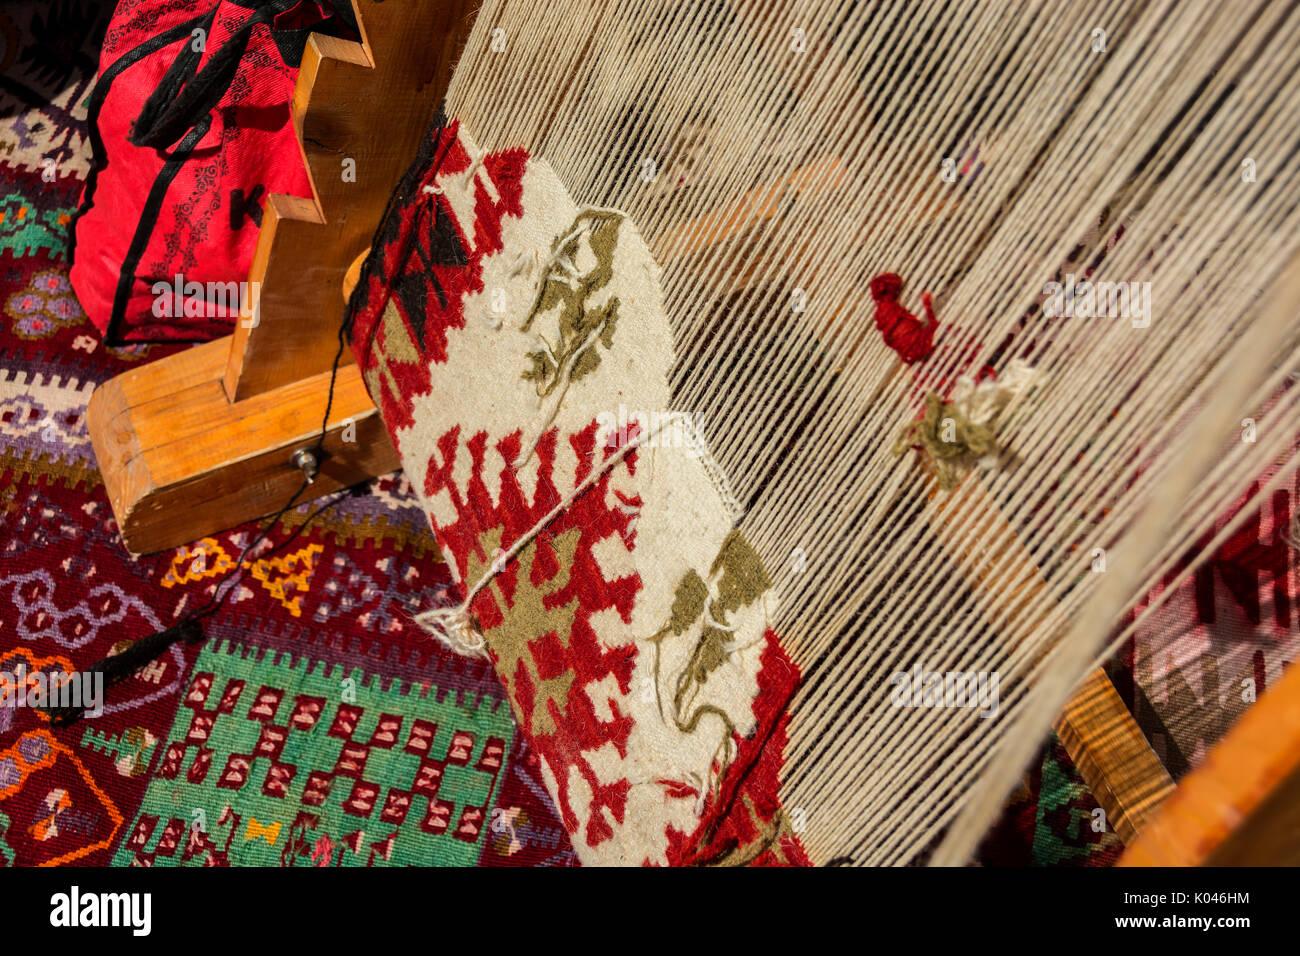 Teppich Weben Webstuhl Stockfoto Bild 154986320 Alamy